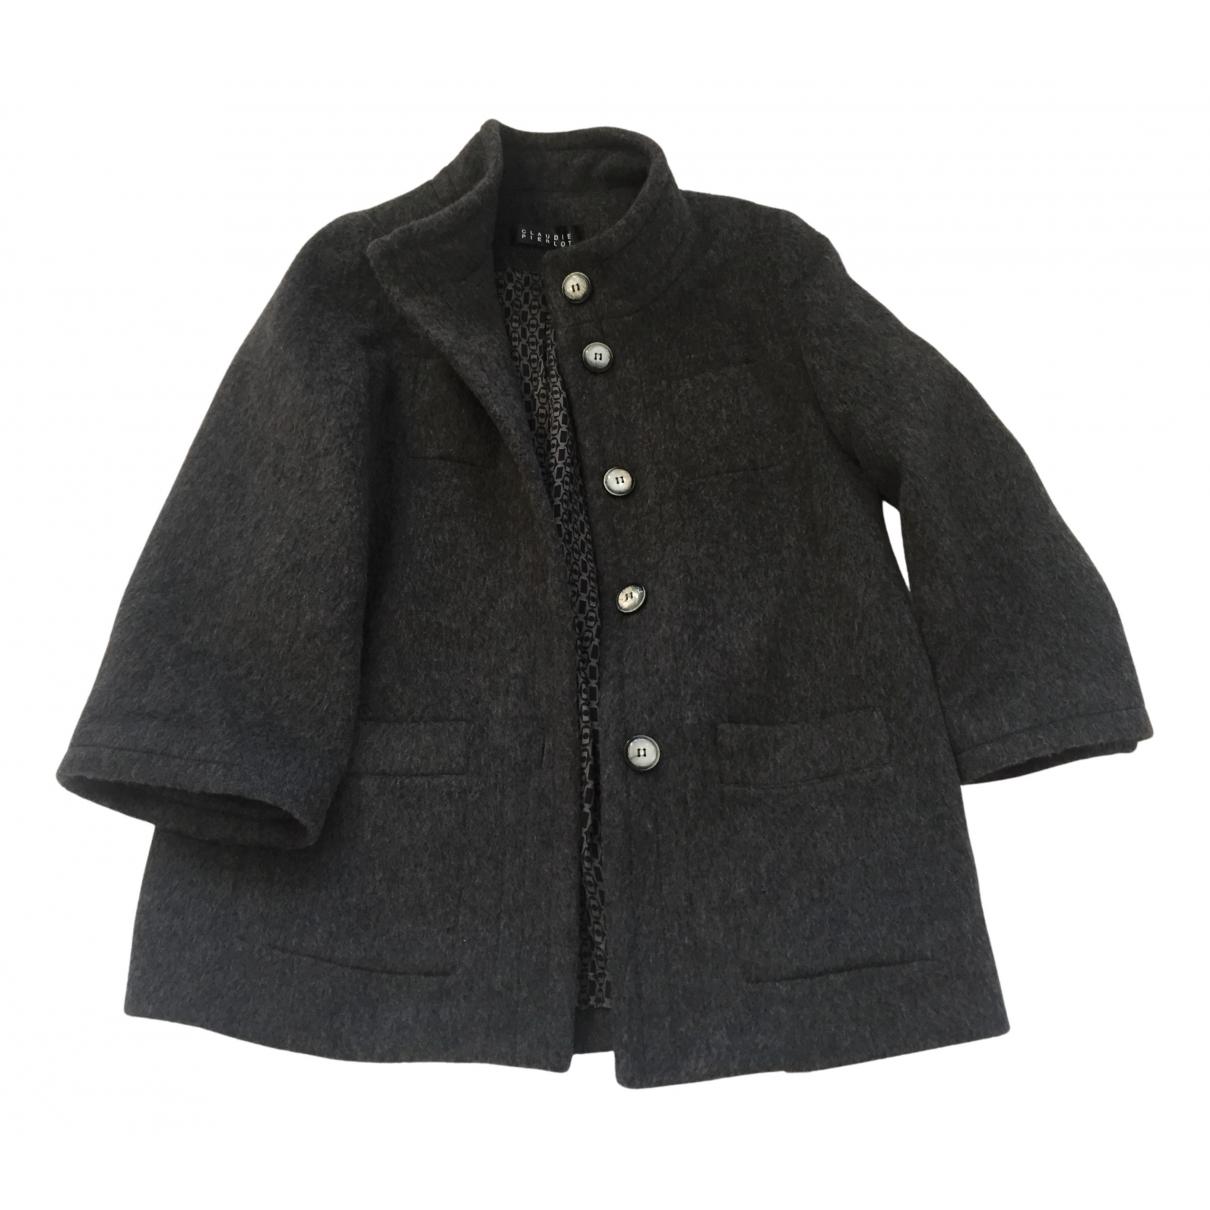 Claudie Pierlot N Anthracite Wool coat for Women 1 0-5